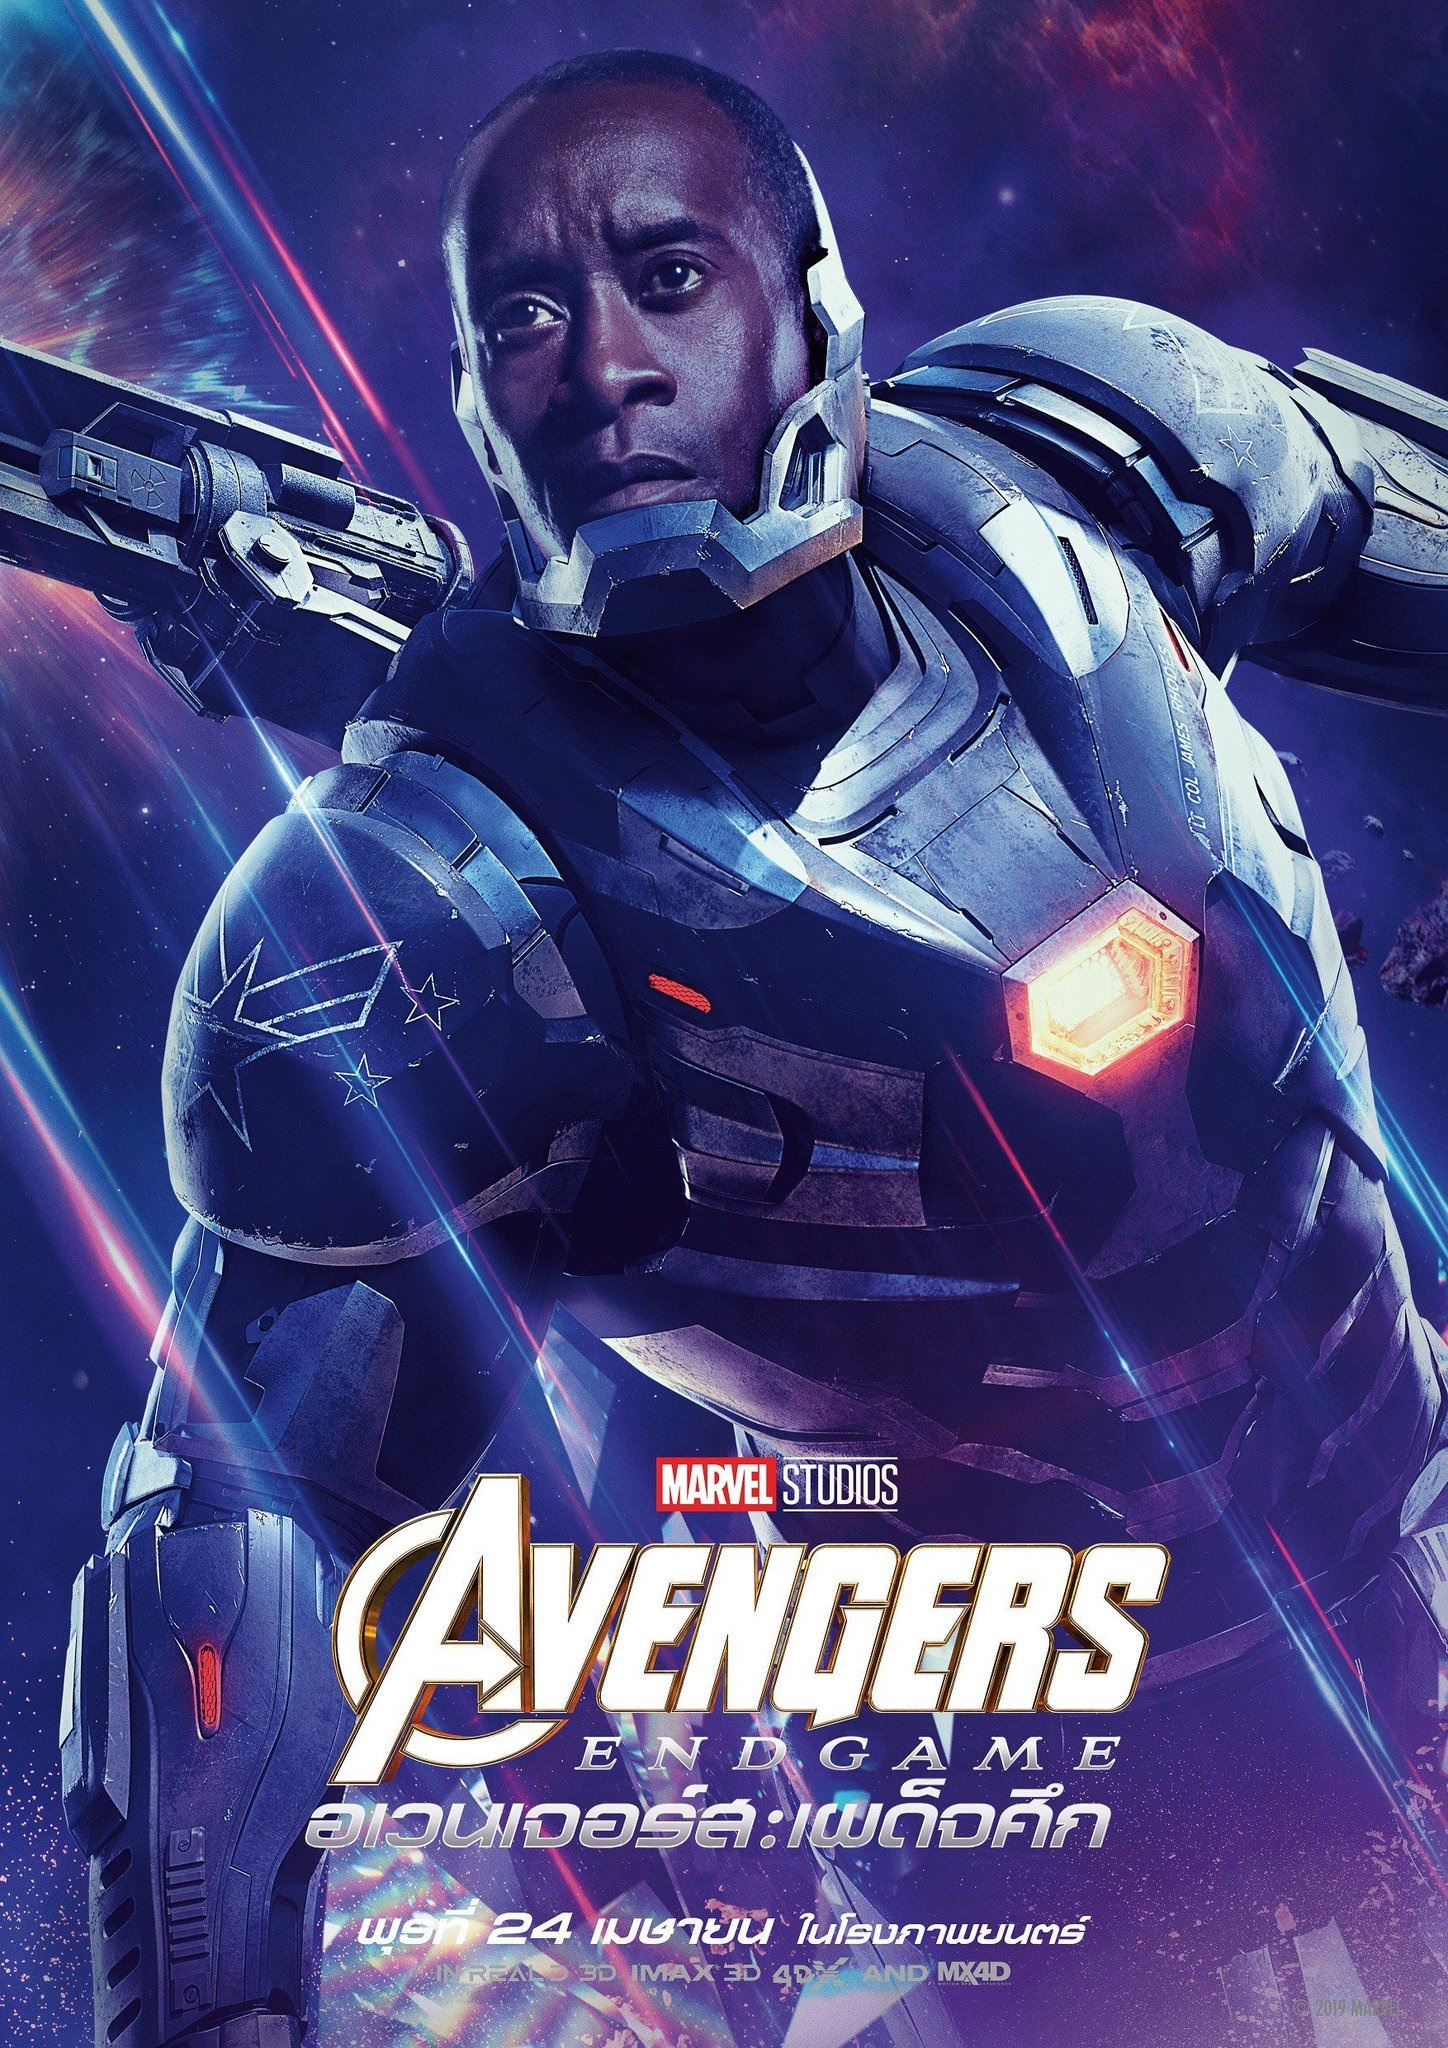 Endgame international character poster for War Machine